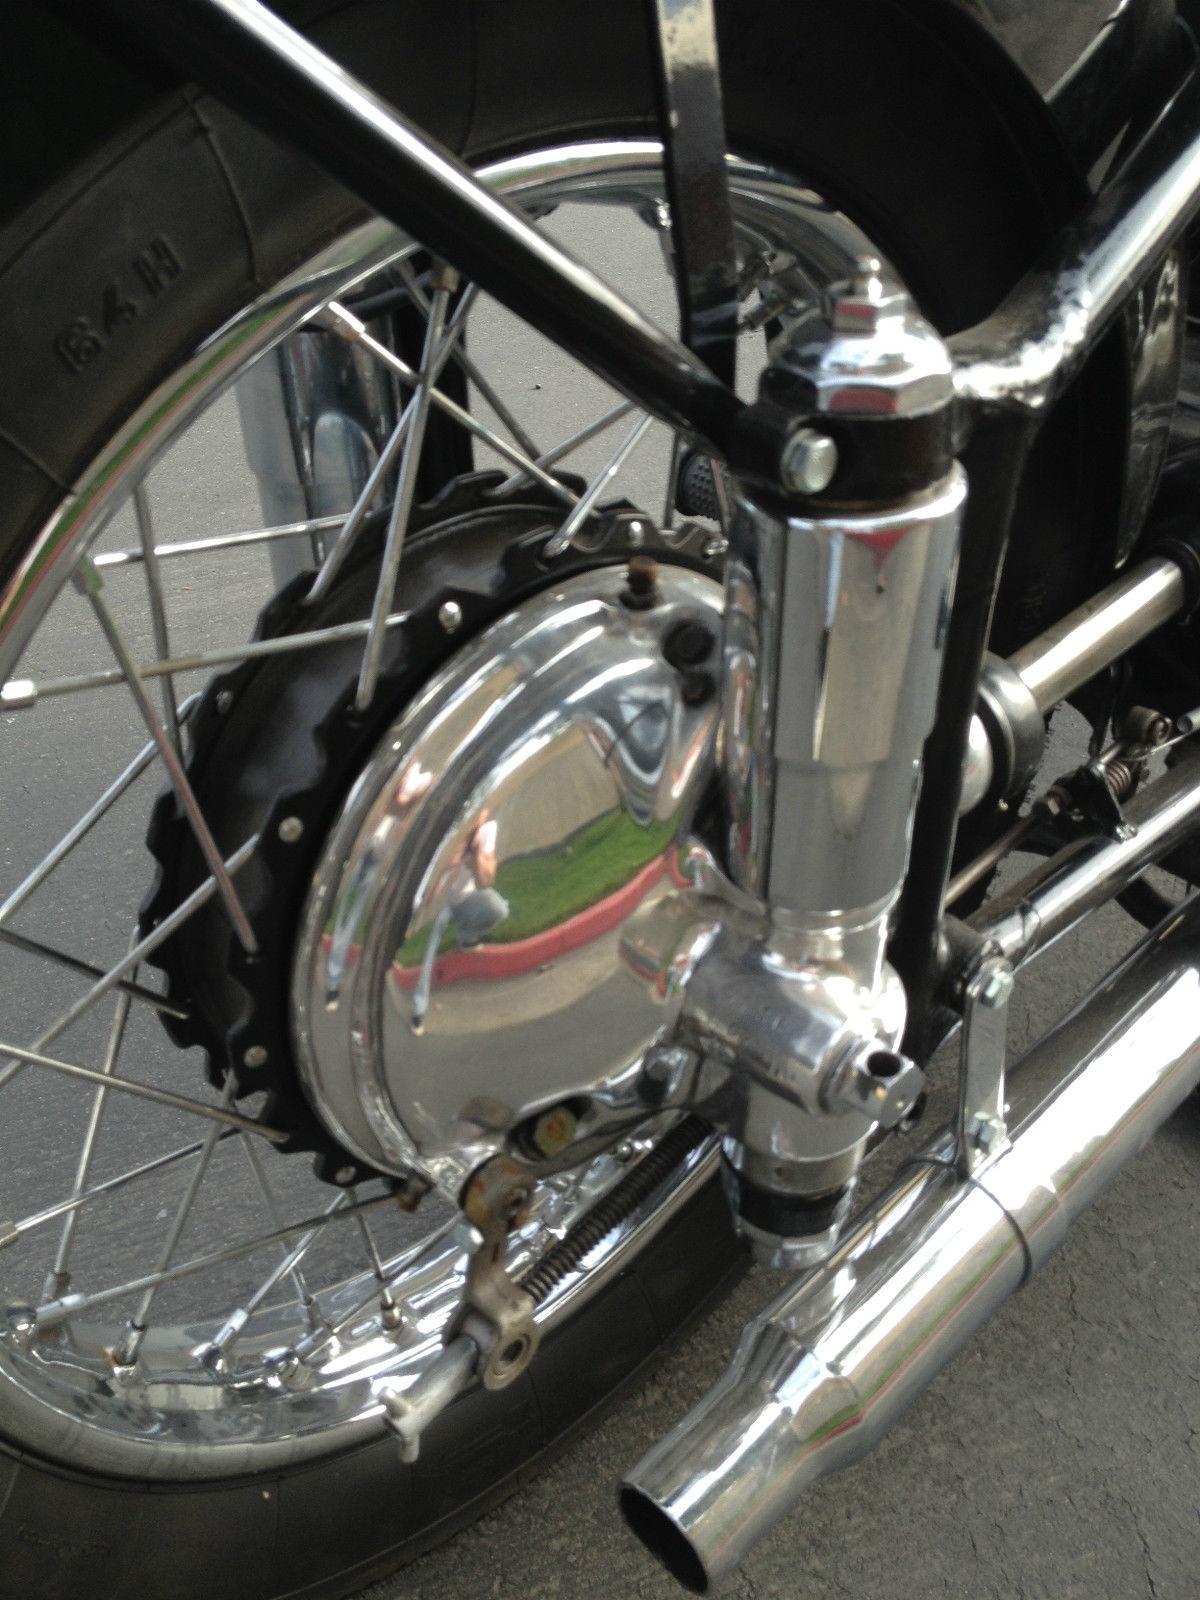 Restored Zundapp Ks601 1952 Photographs At Classic Bikes